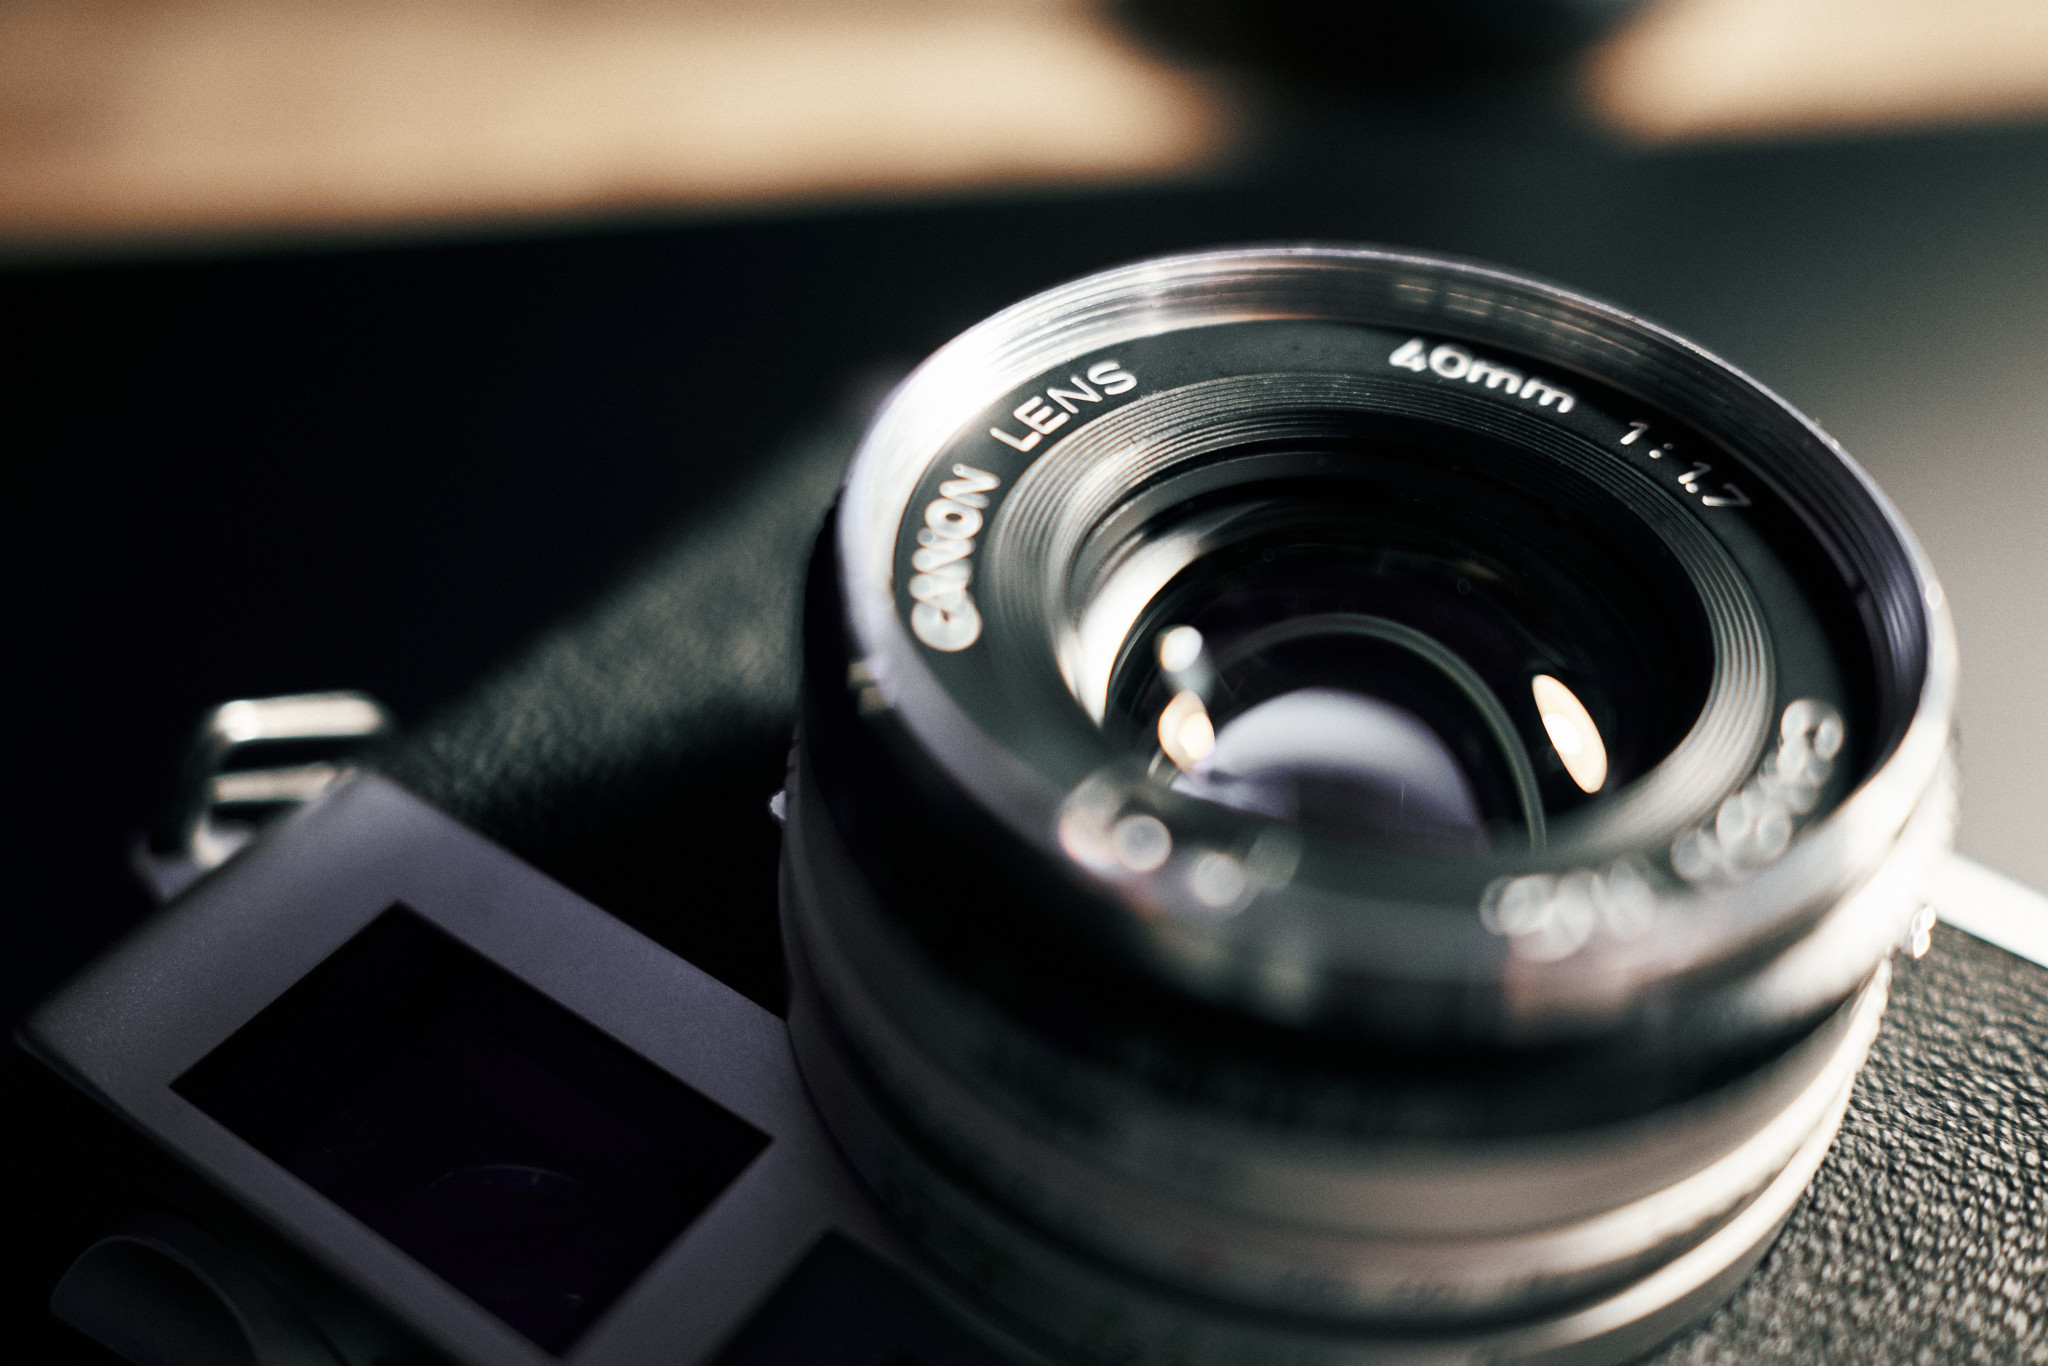 03-Canonet-G-III-17.jpg